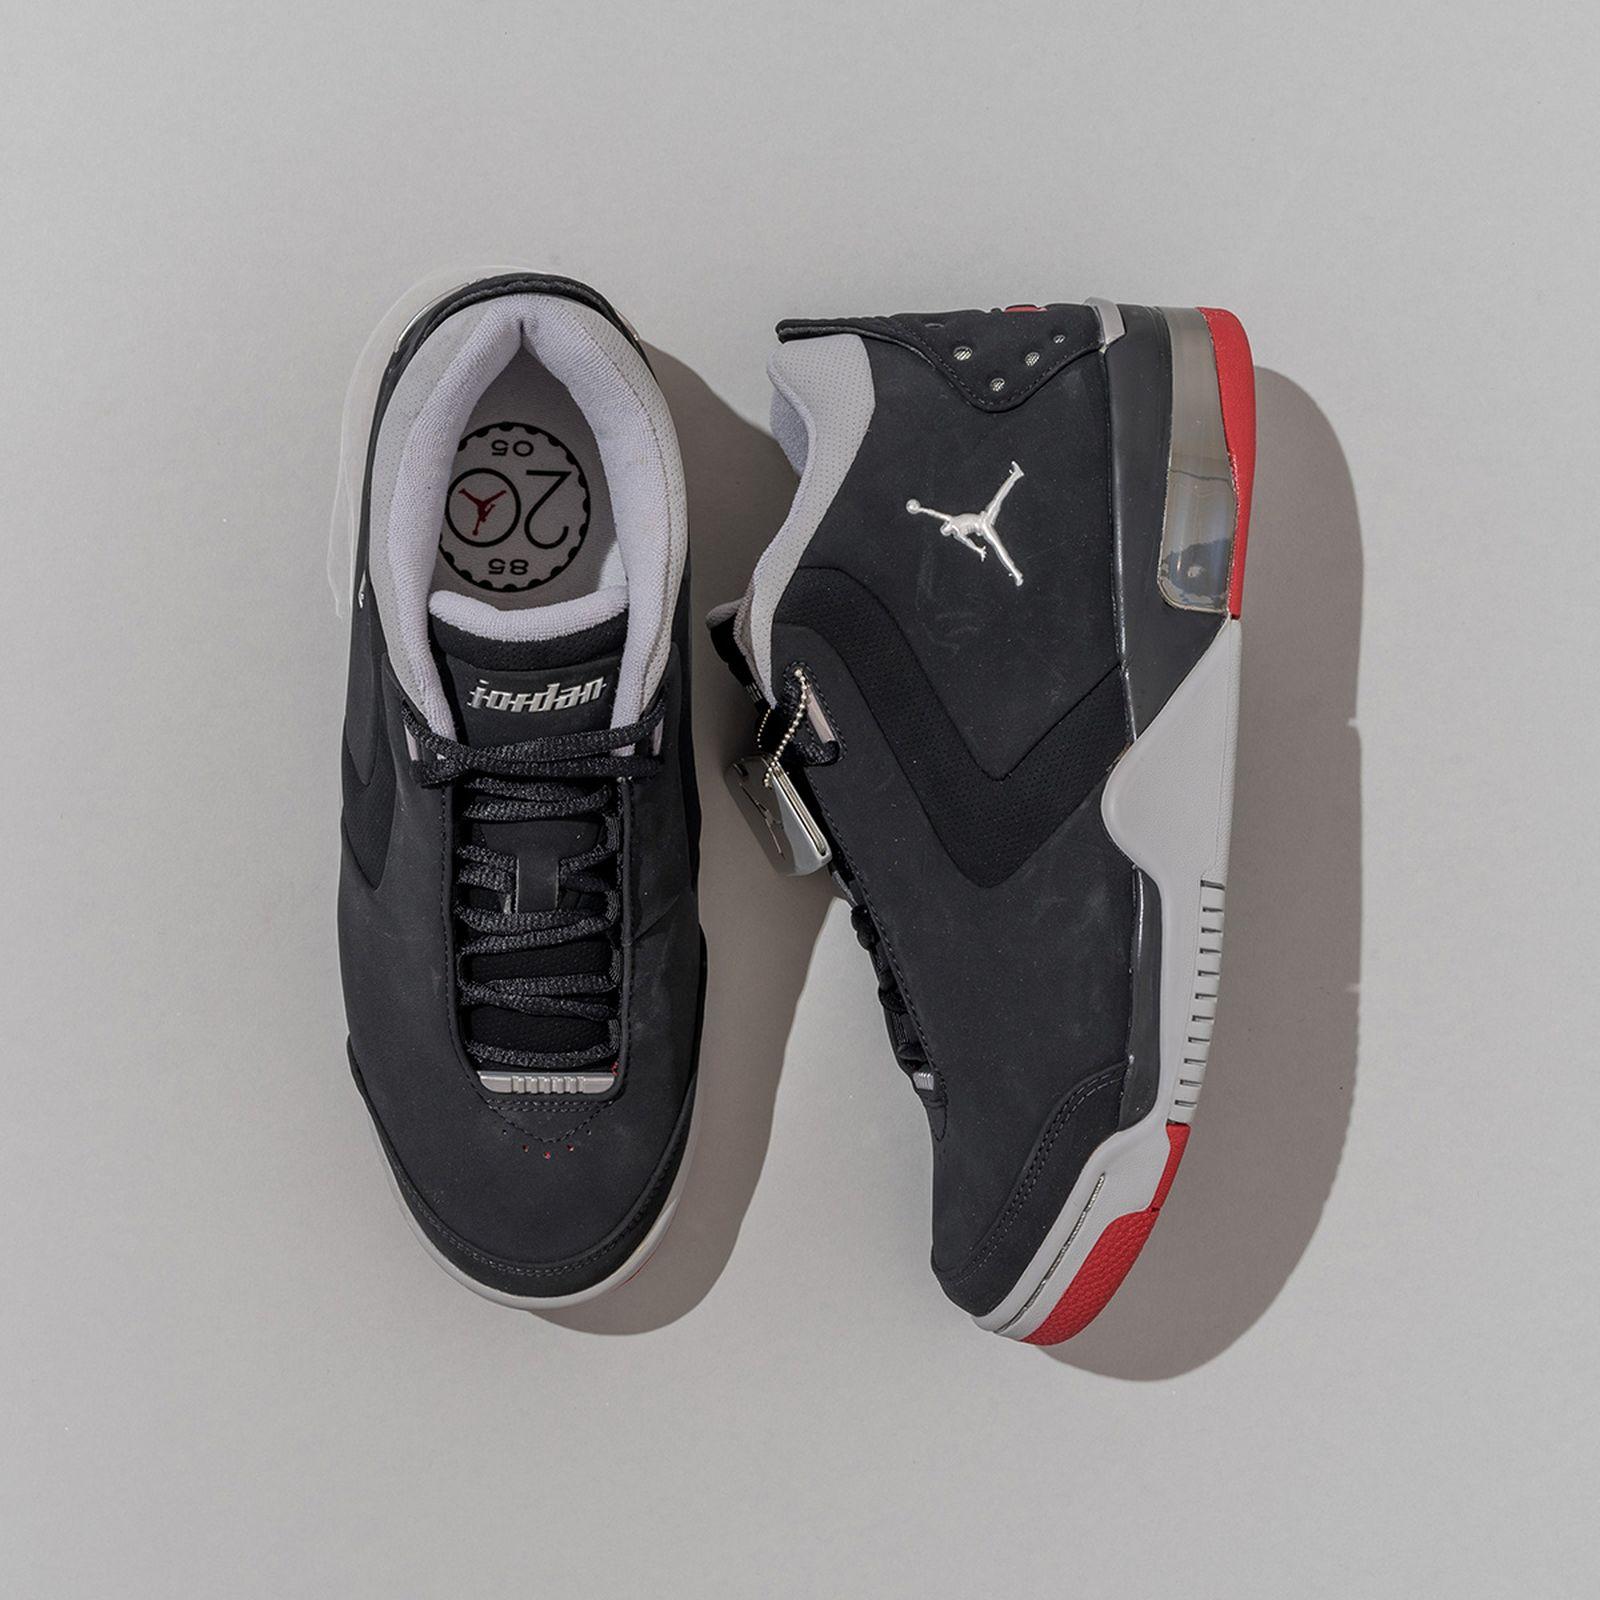 brad-hogan-jordan-sneaker-collection-05